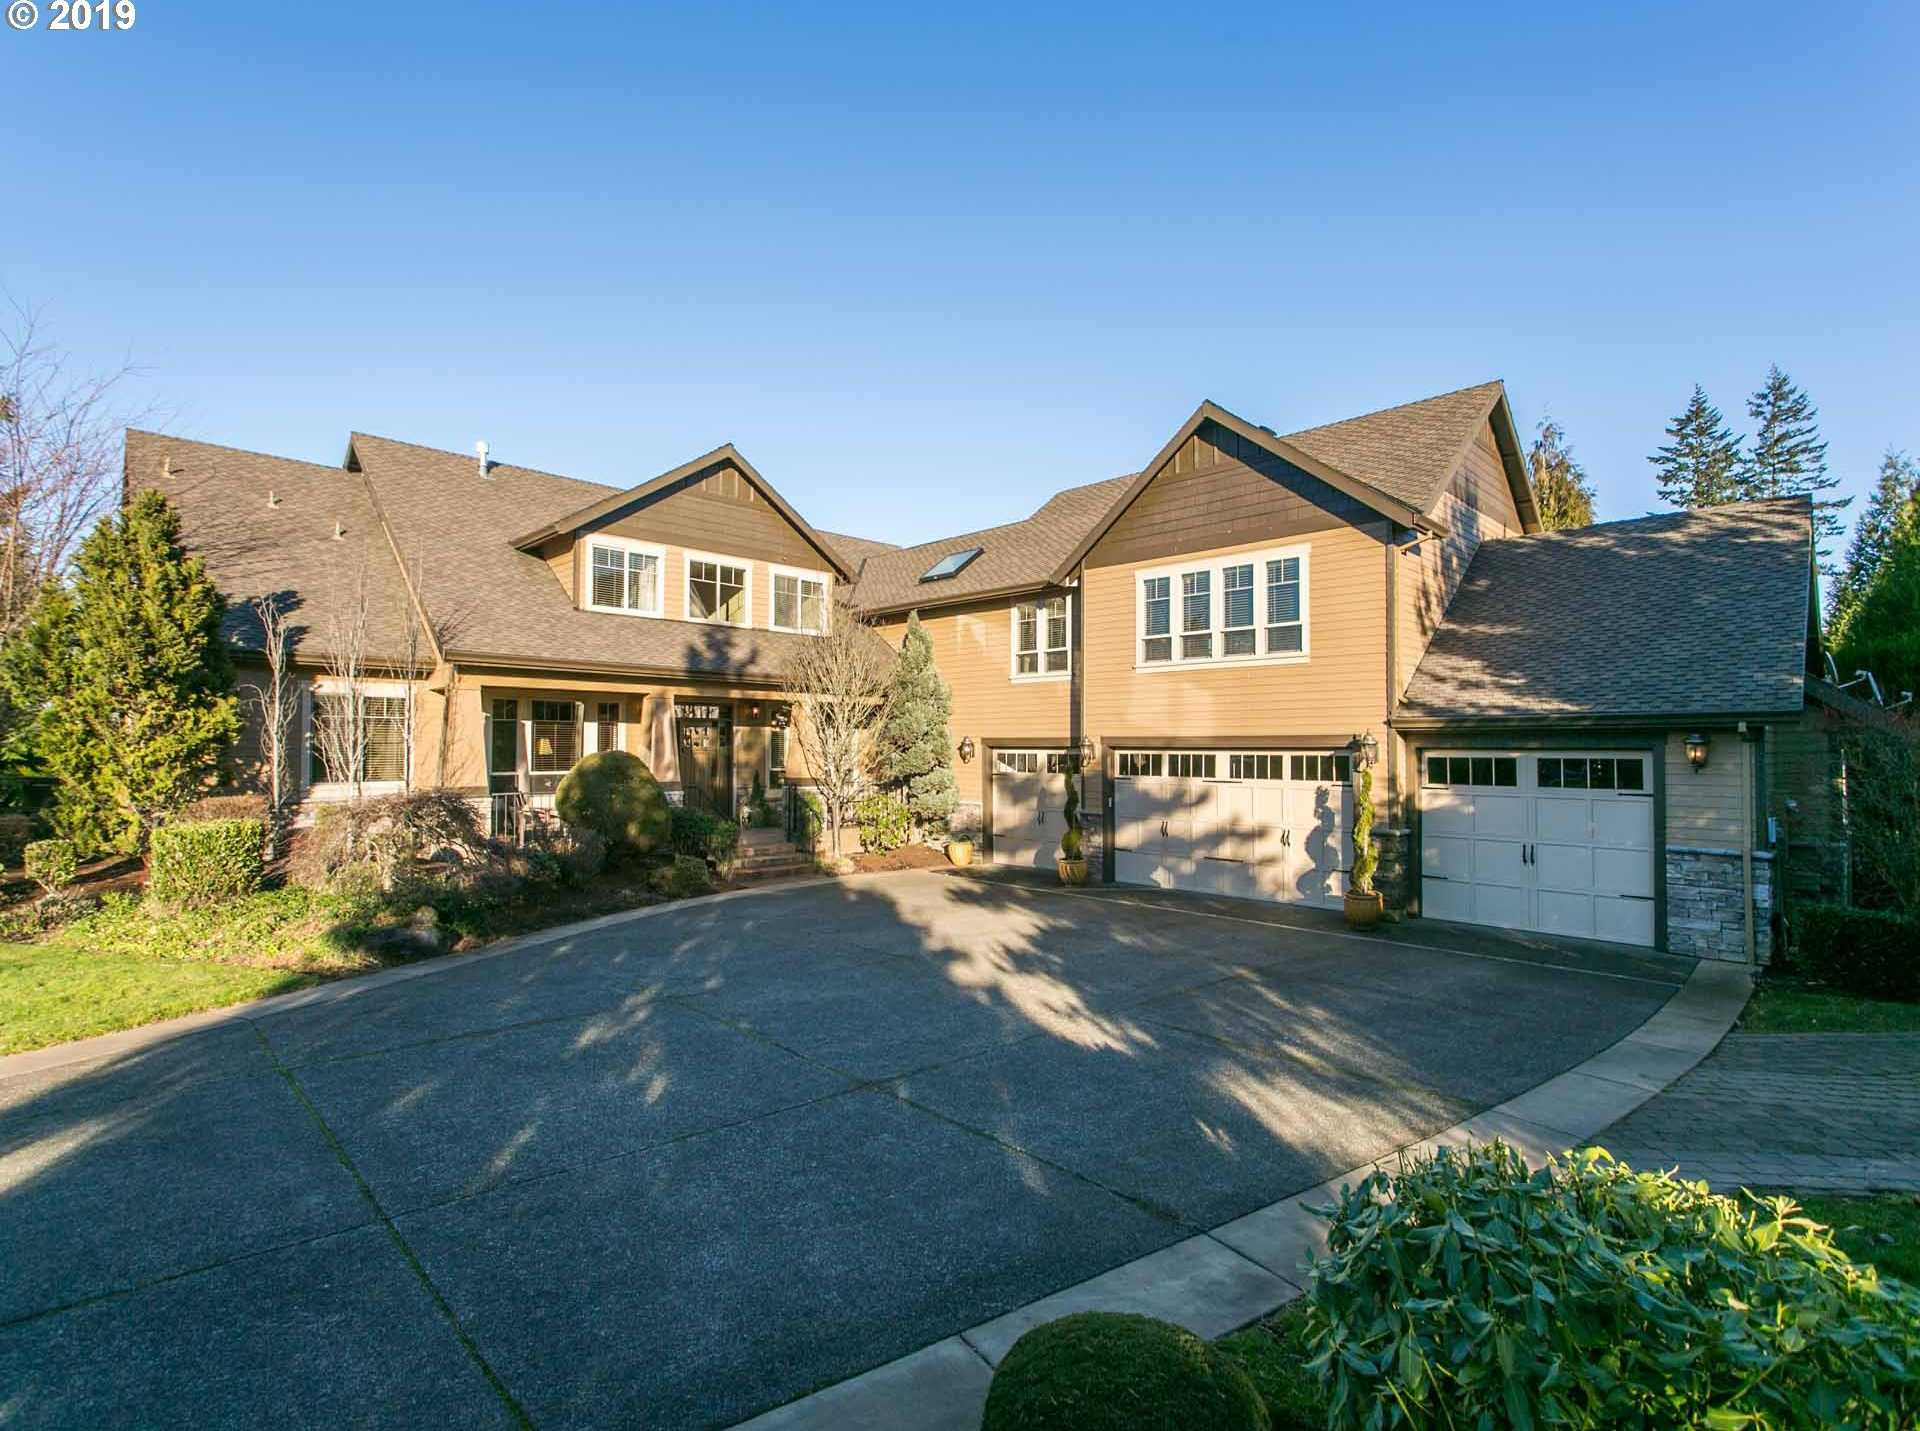 $1,499,900 - 5Br/5Ba -  for Sale in Beaver Lake, Oregon City